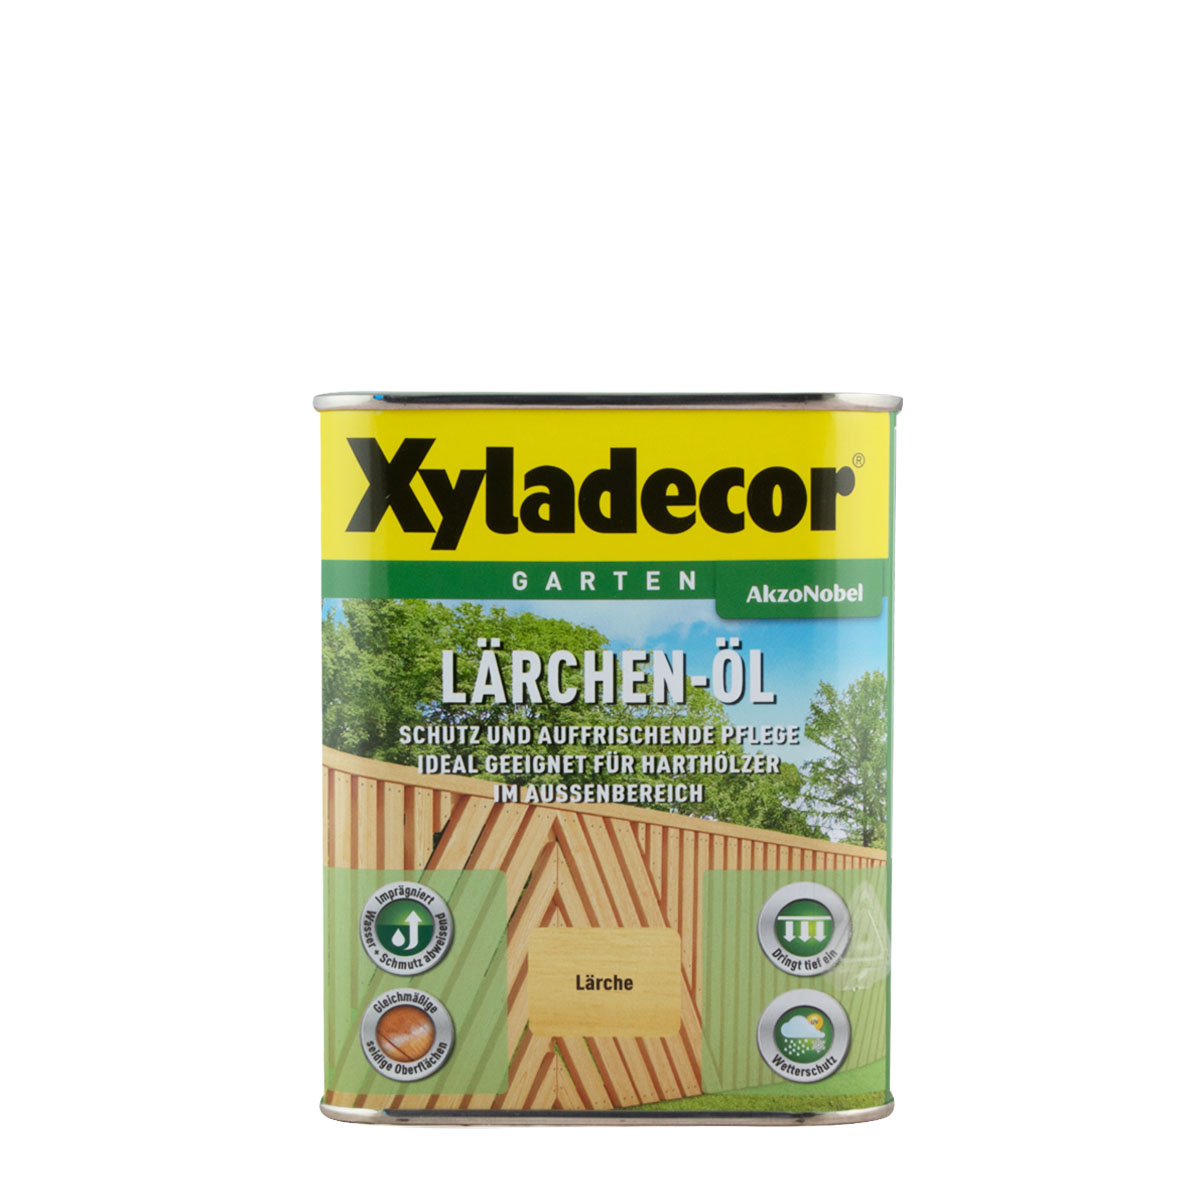 Xyladecor Lärchen-Öl 750ml, Pflegeöl, Terrassenöl